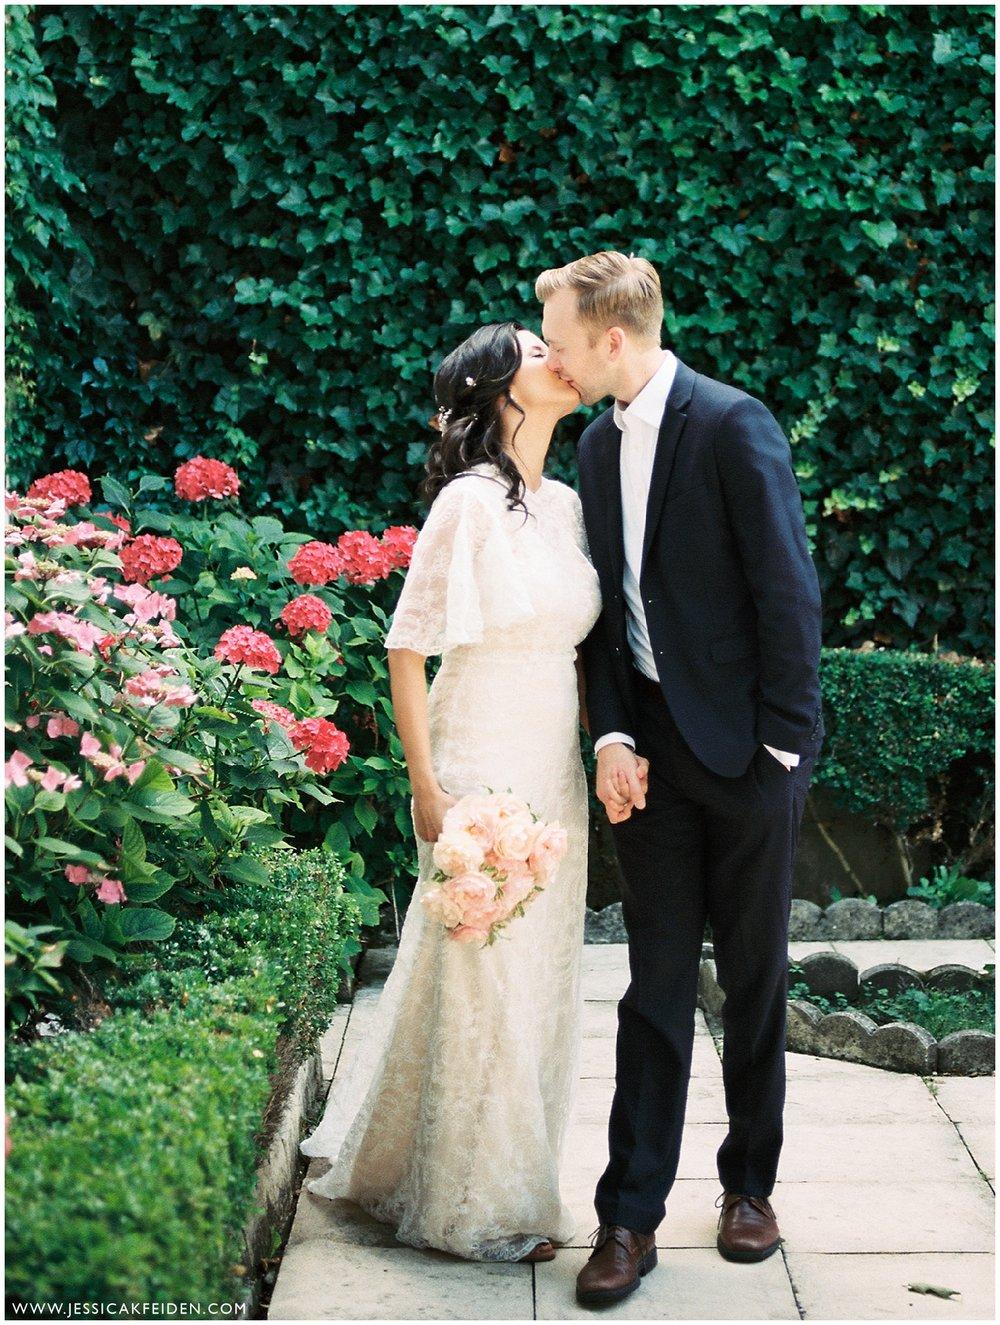 Jessica K Feiden Photography - Destination Paris Wedding_Film Photography_0003.jpg